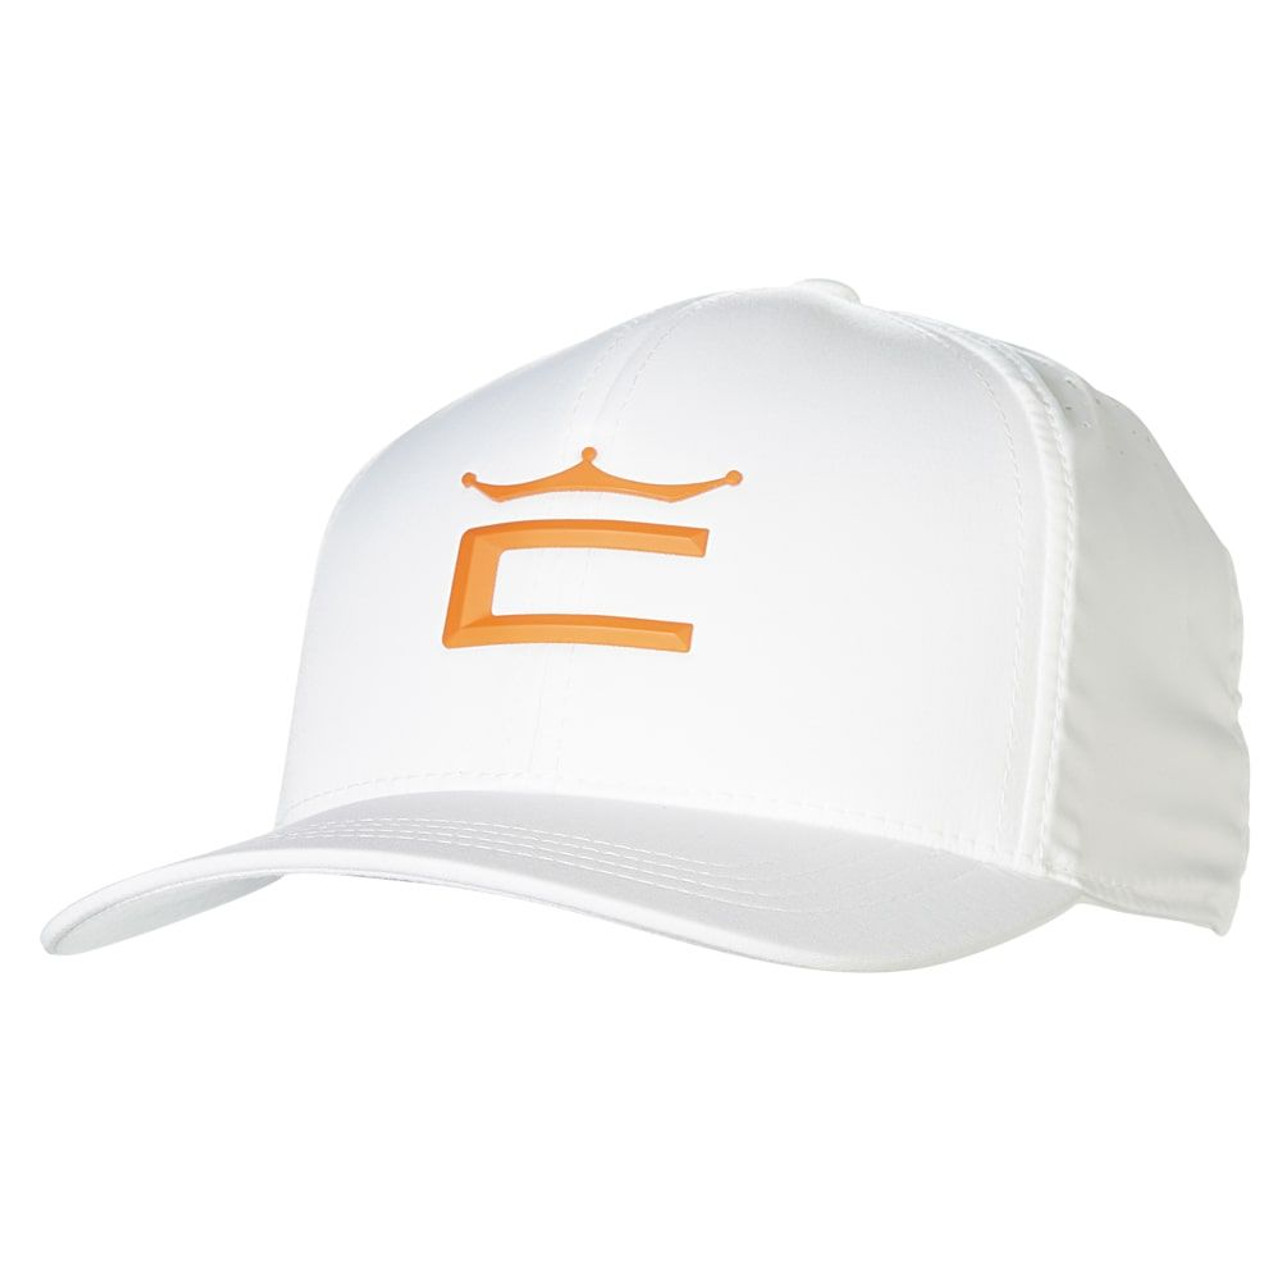 Cobra Tour Crown 110 Cap - White / Vibrant Orange